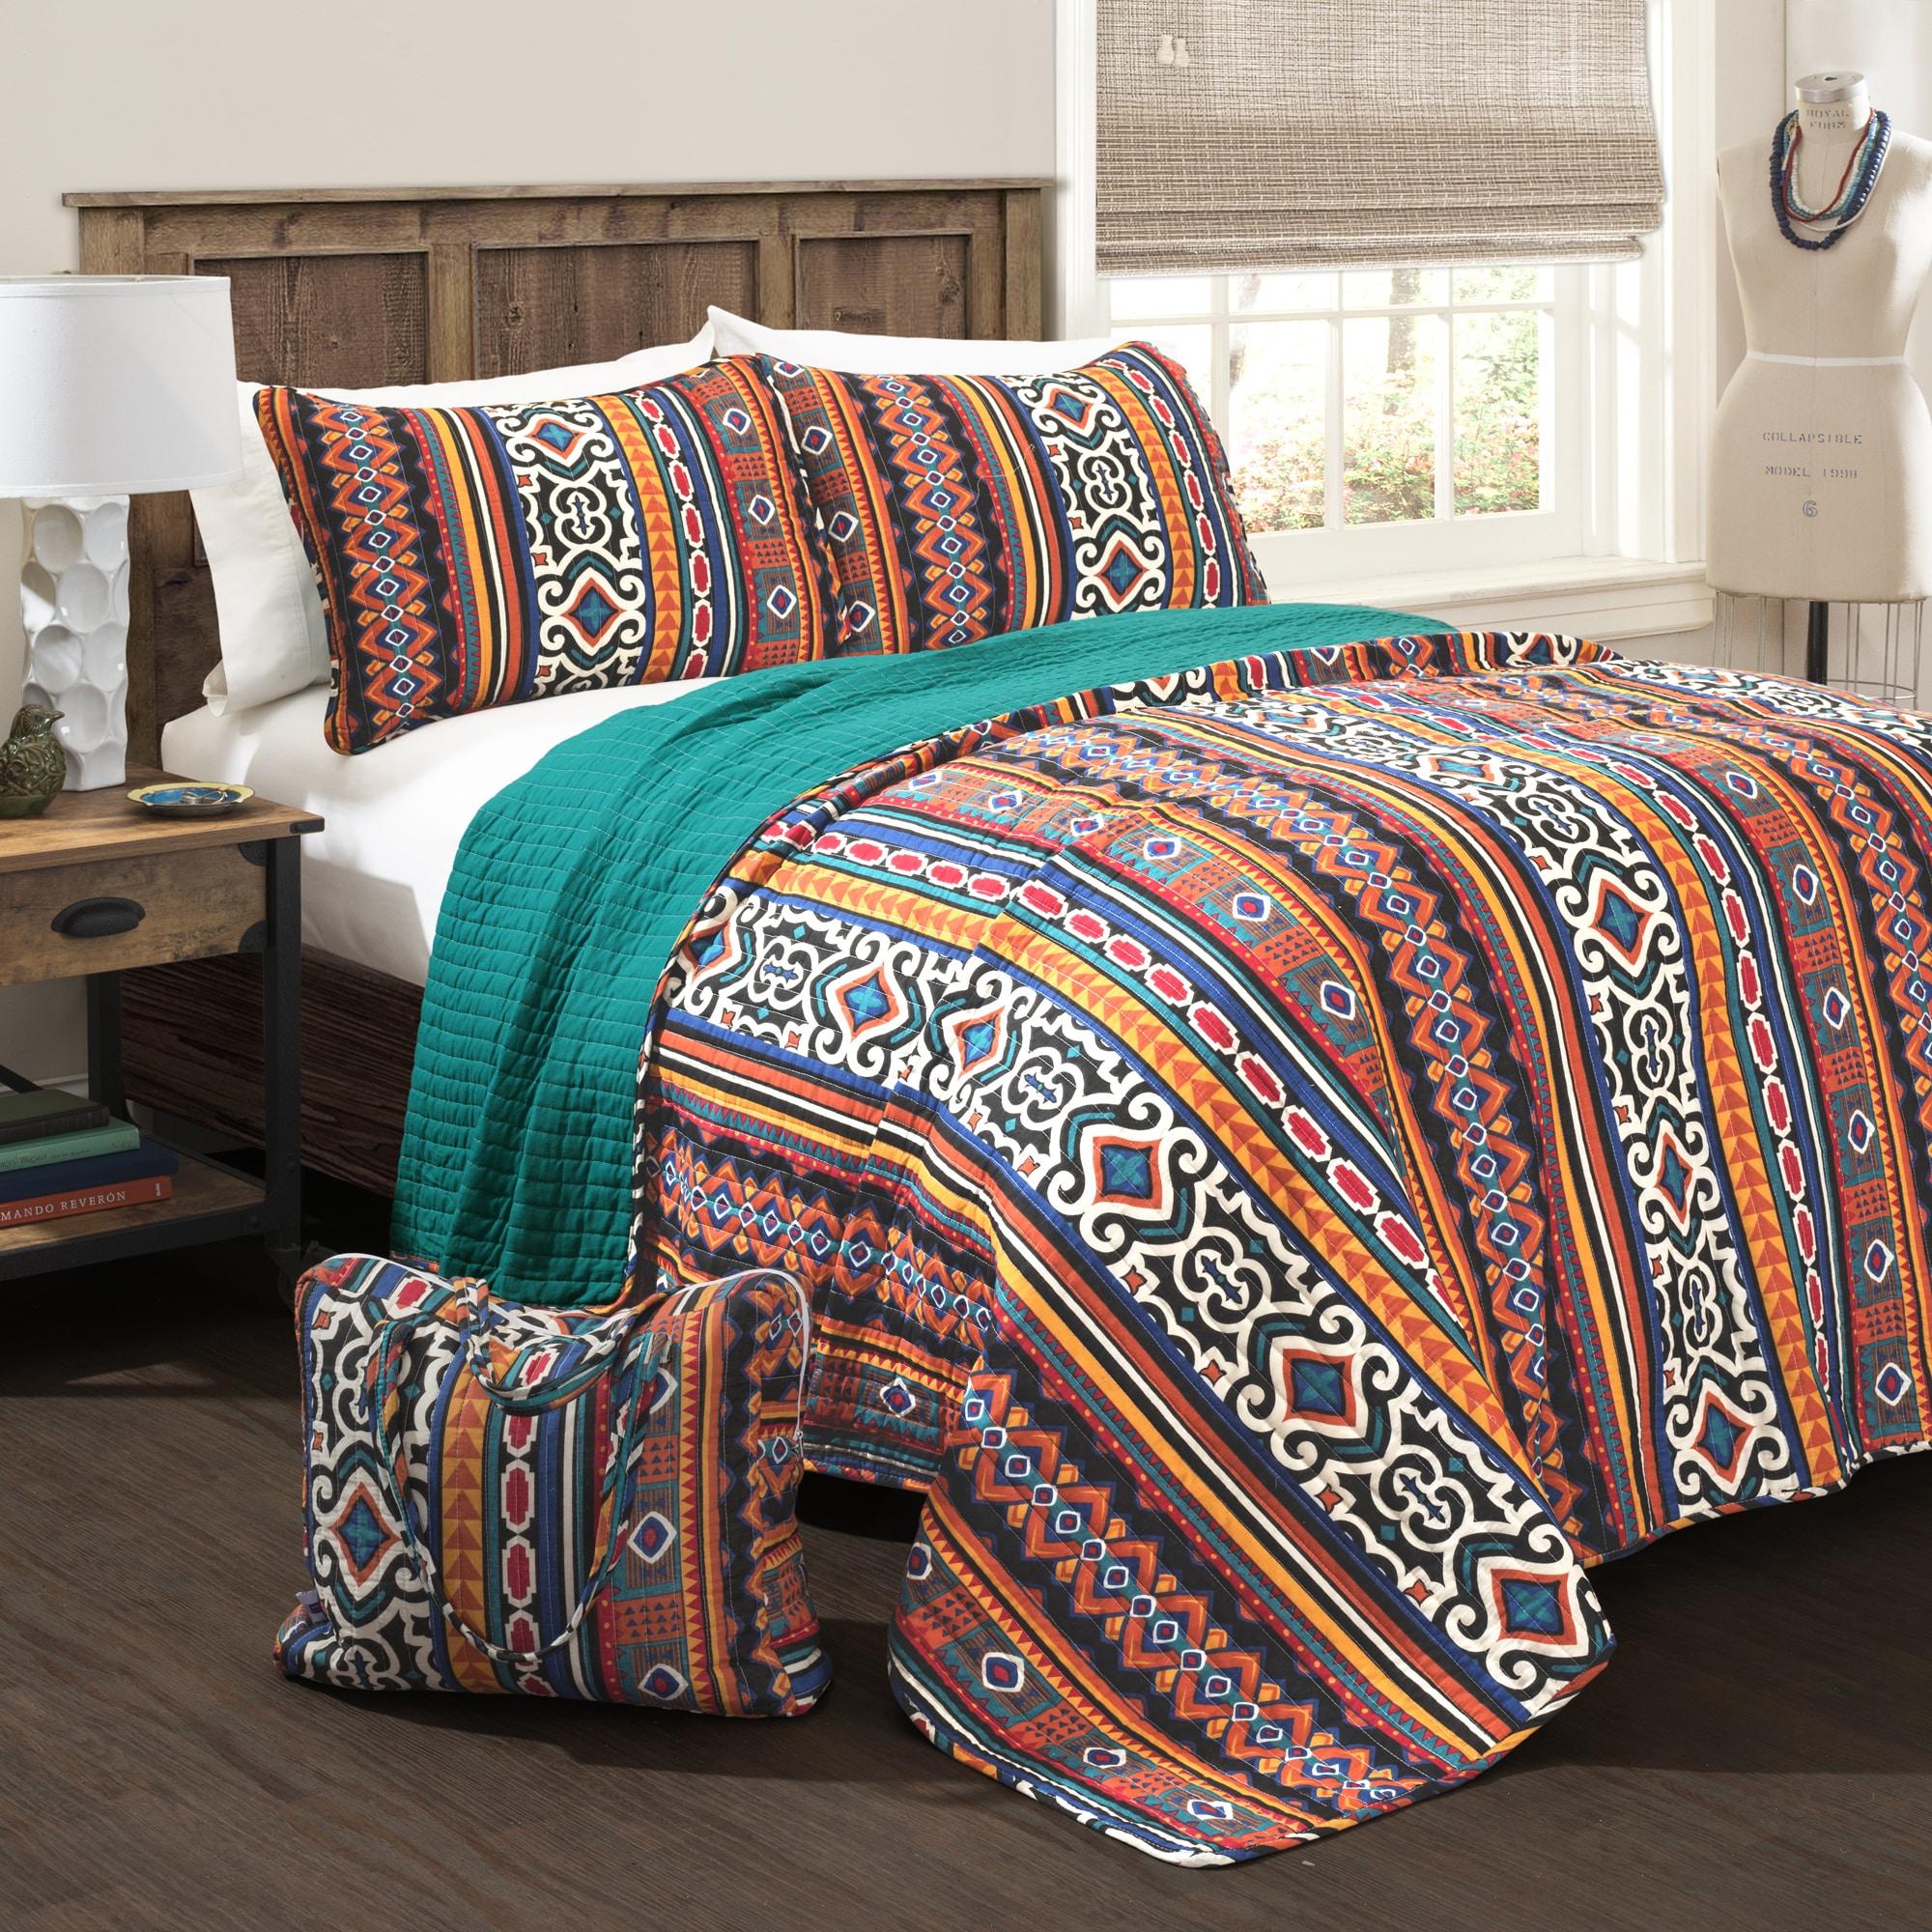 Lush Decor Bettina 4-piece Quilt Set with Bonus Tote (As ...